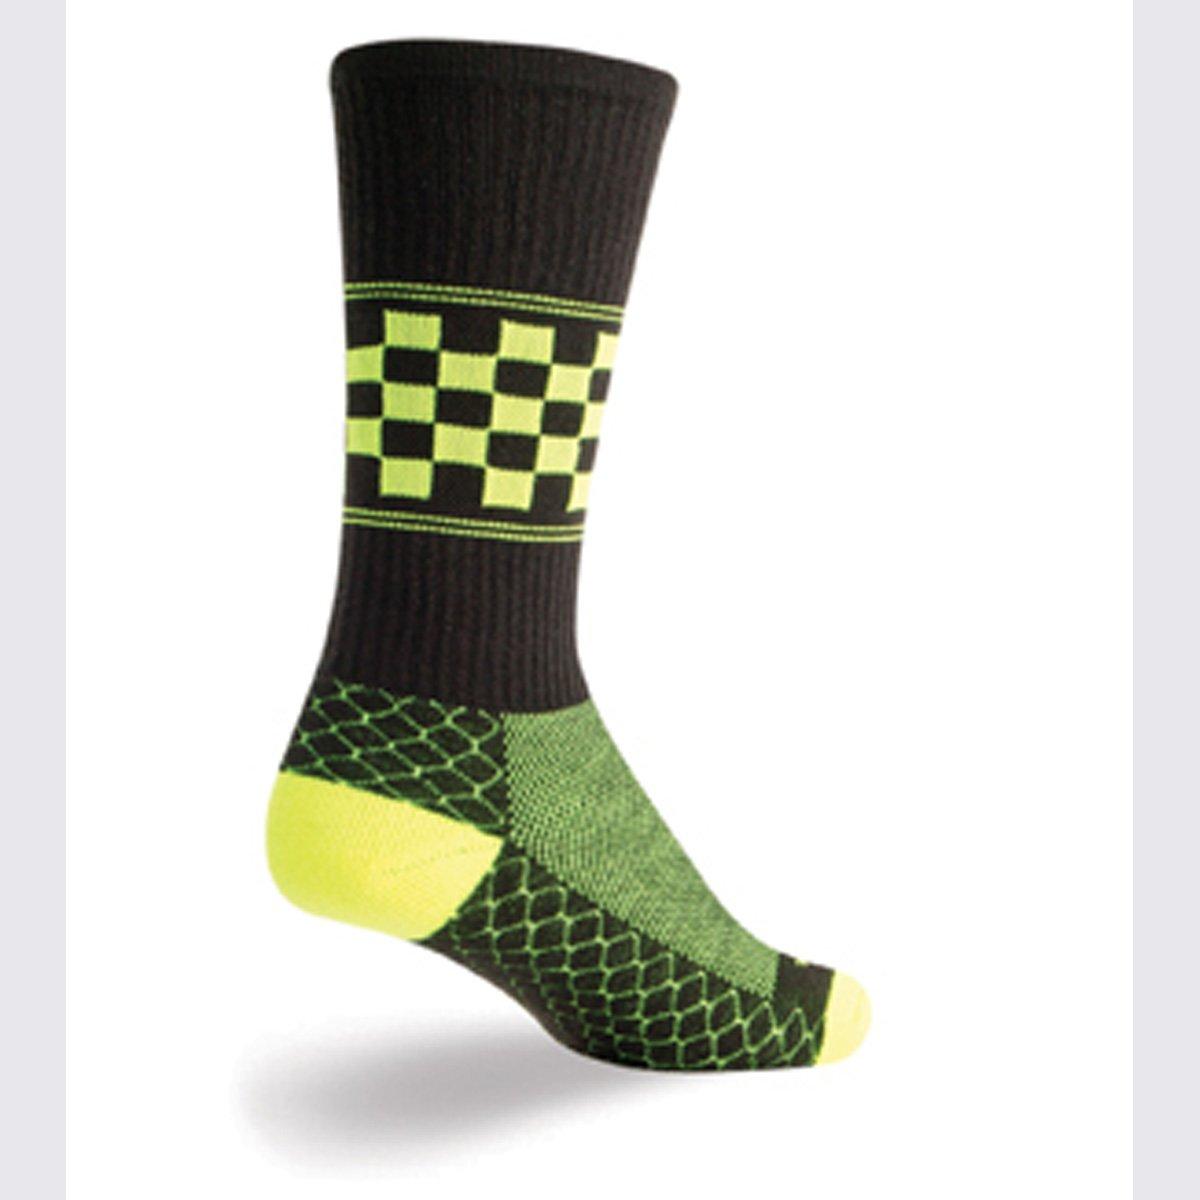 cb9d675f36ec6 Amazon.com : SockGuy Crew 8in LAX Chex Padded Lacrosse Socks : Sports &  Outdoors